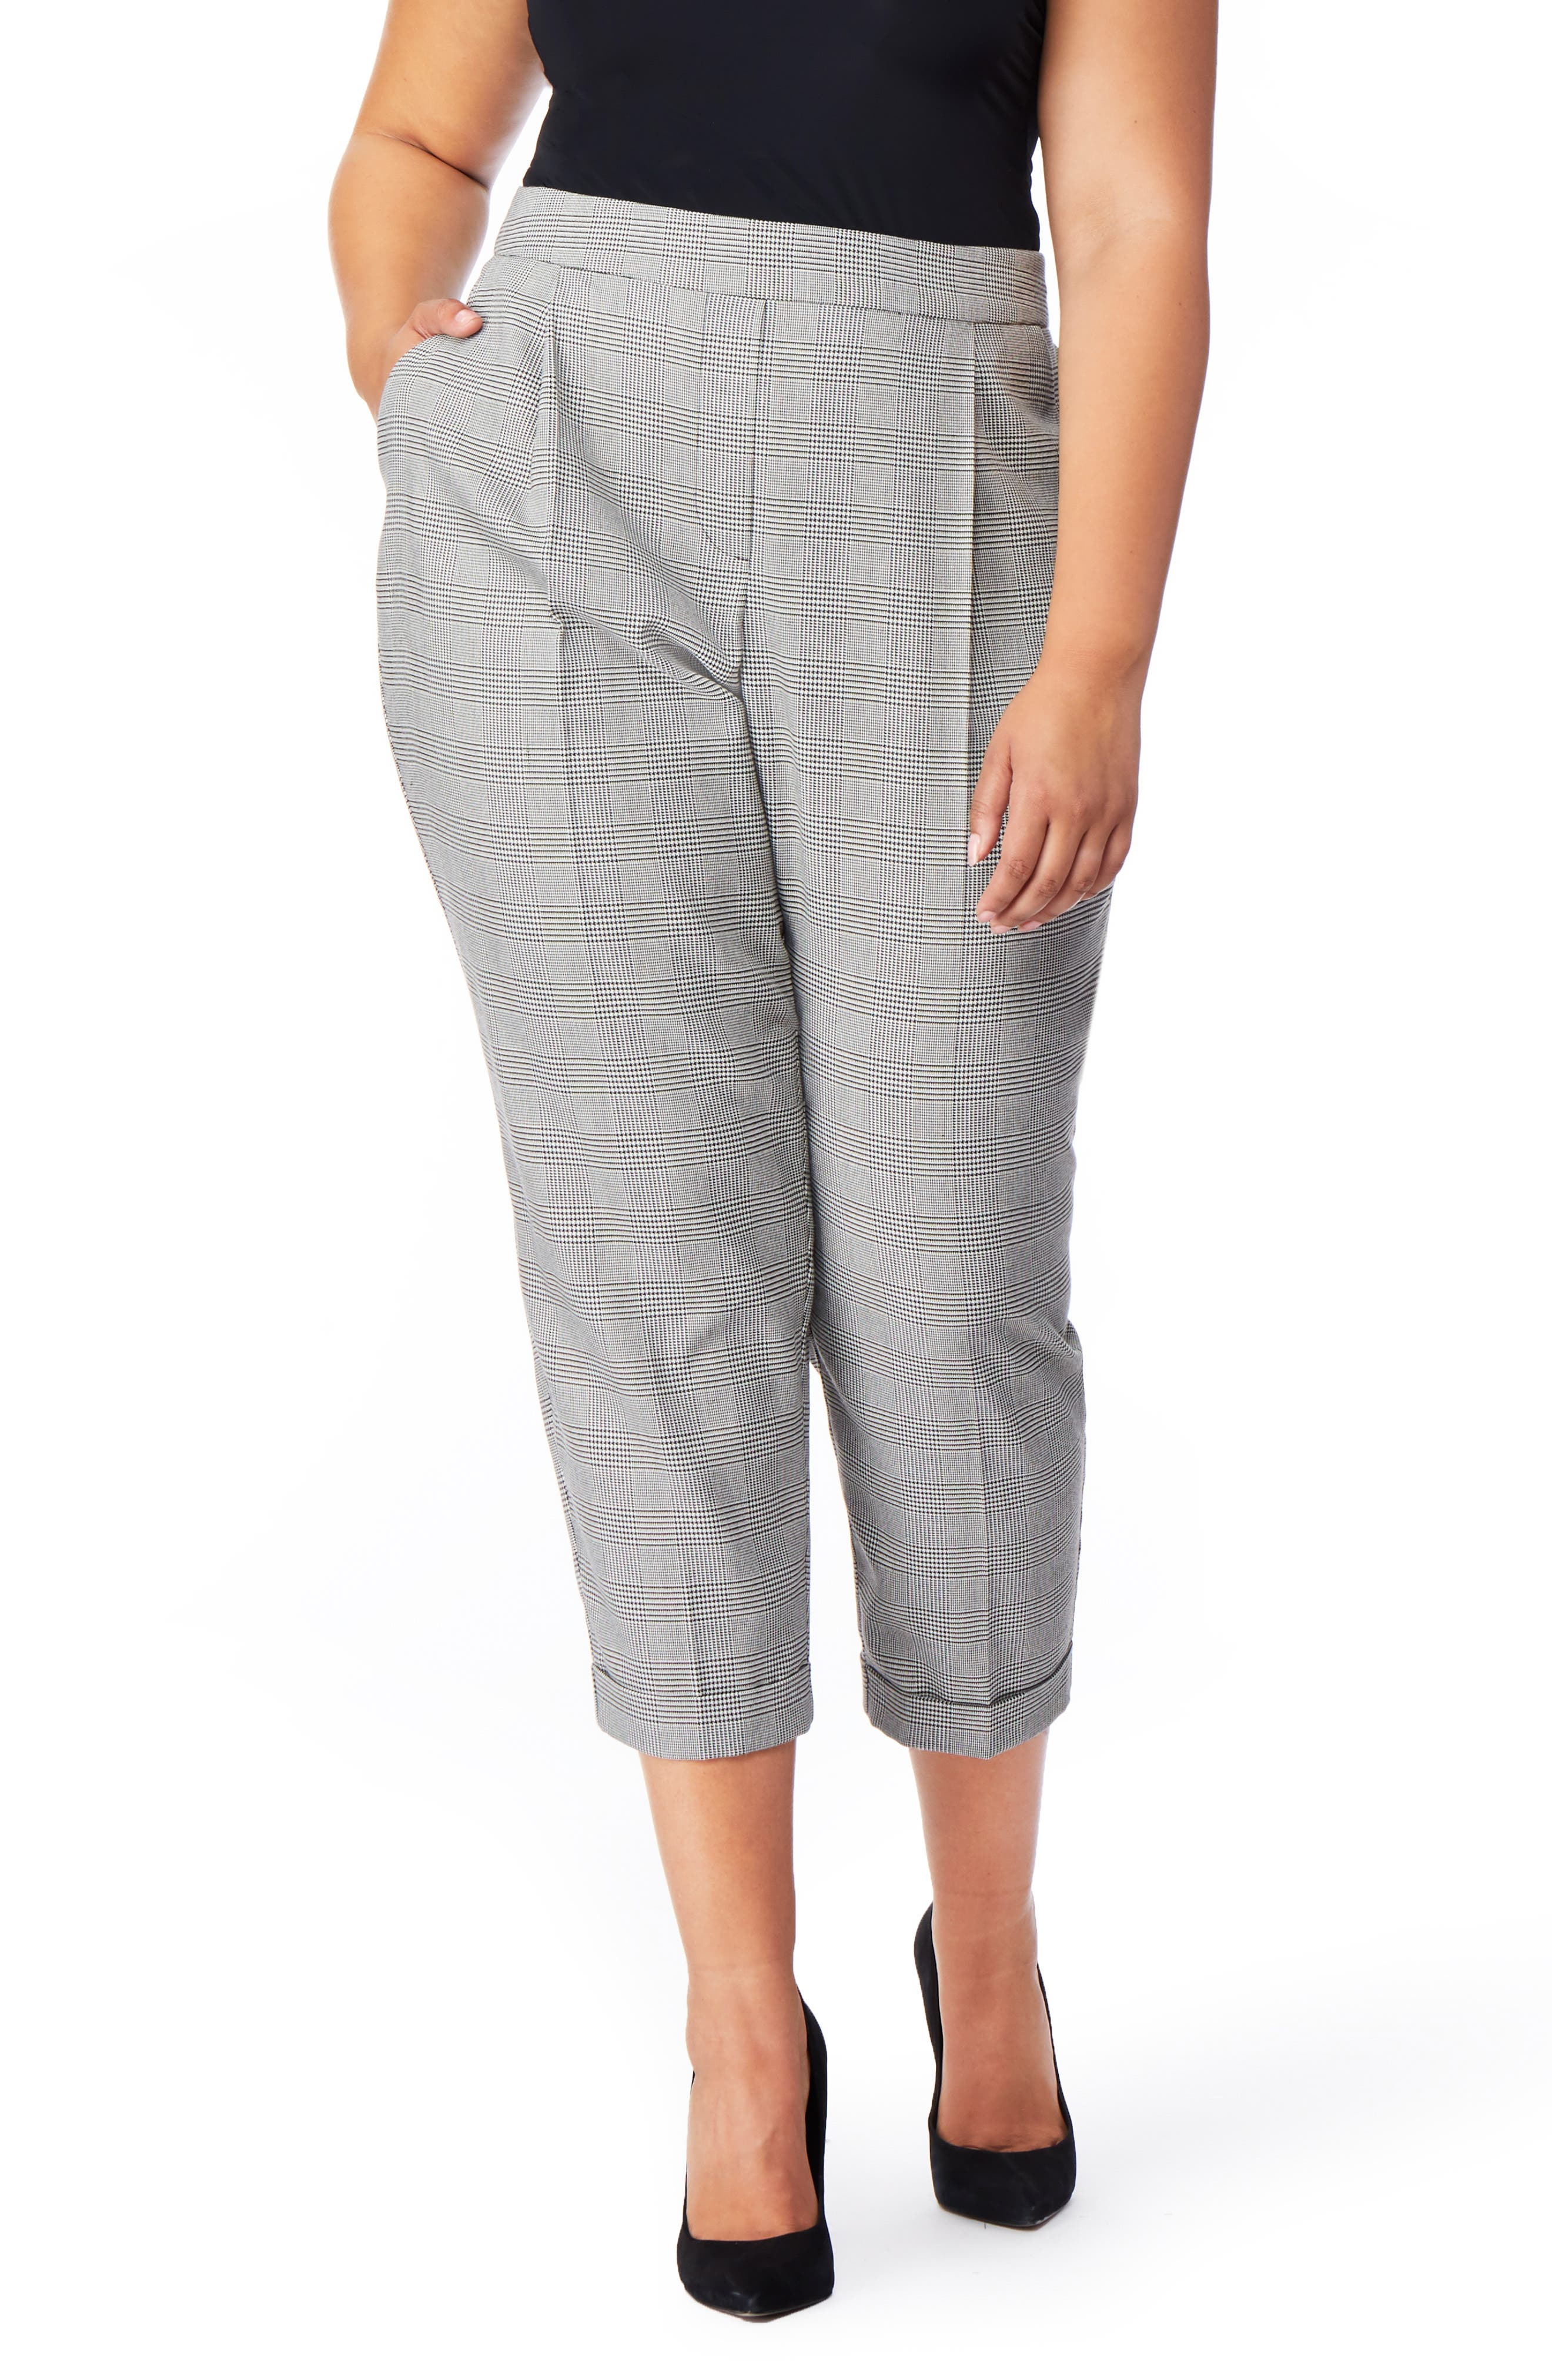 REBEL WILSON X ANGELS High Rise Cuffed Tuxedo Pants, Main, color, 020